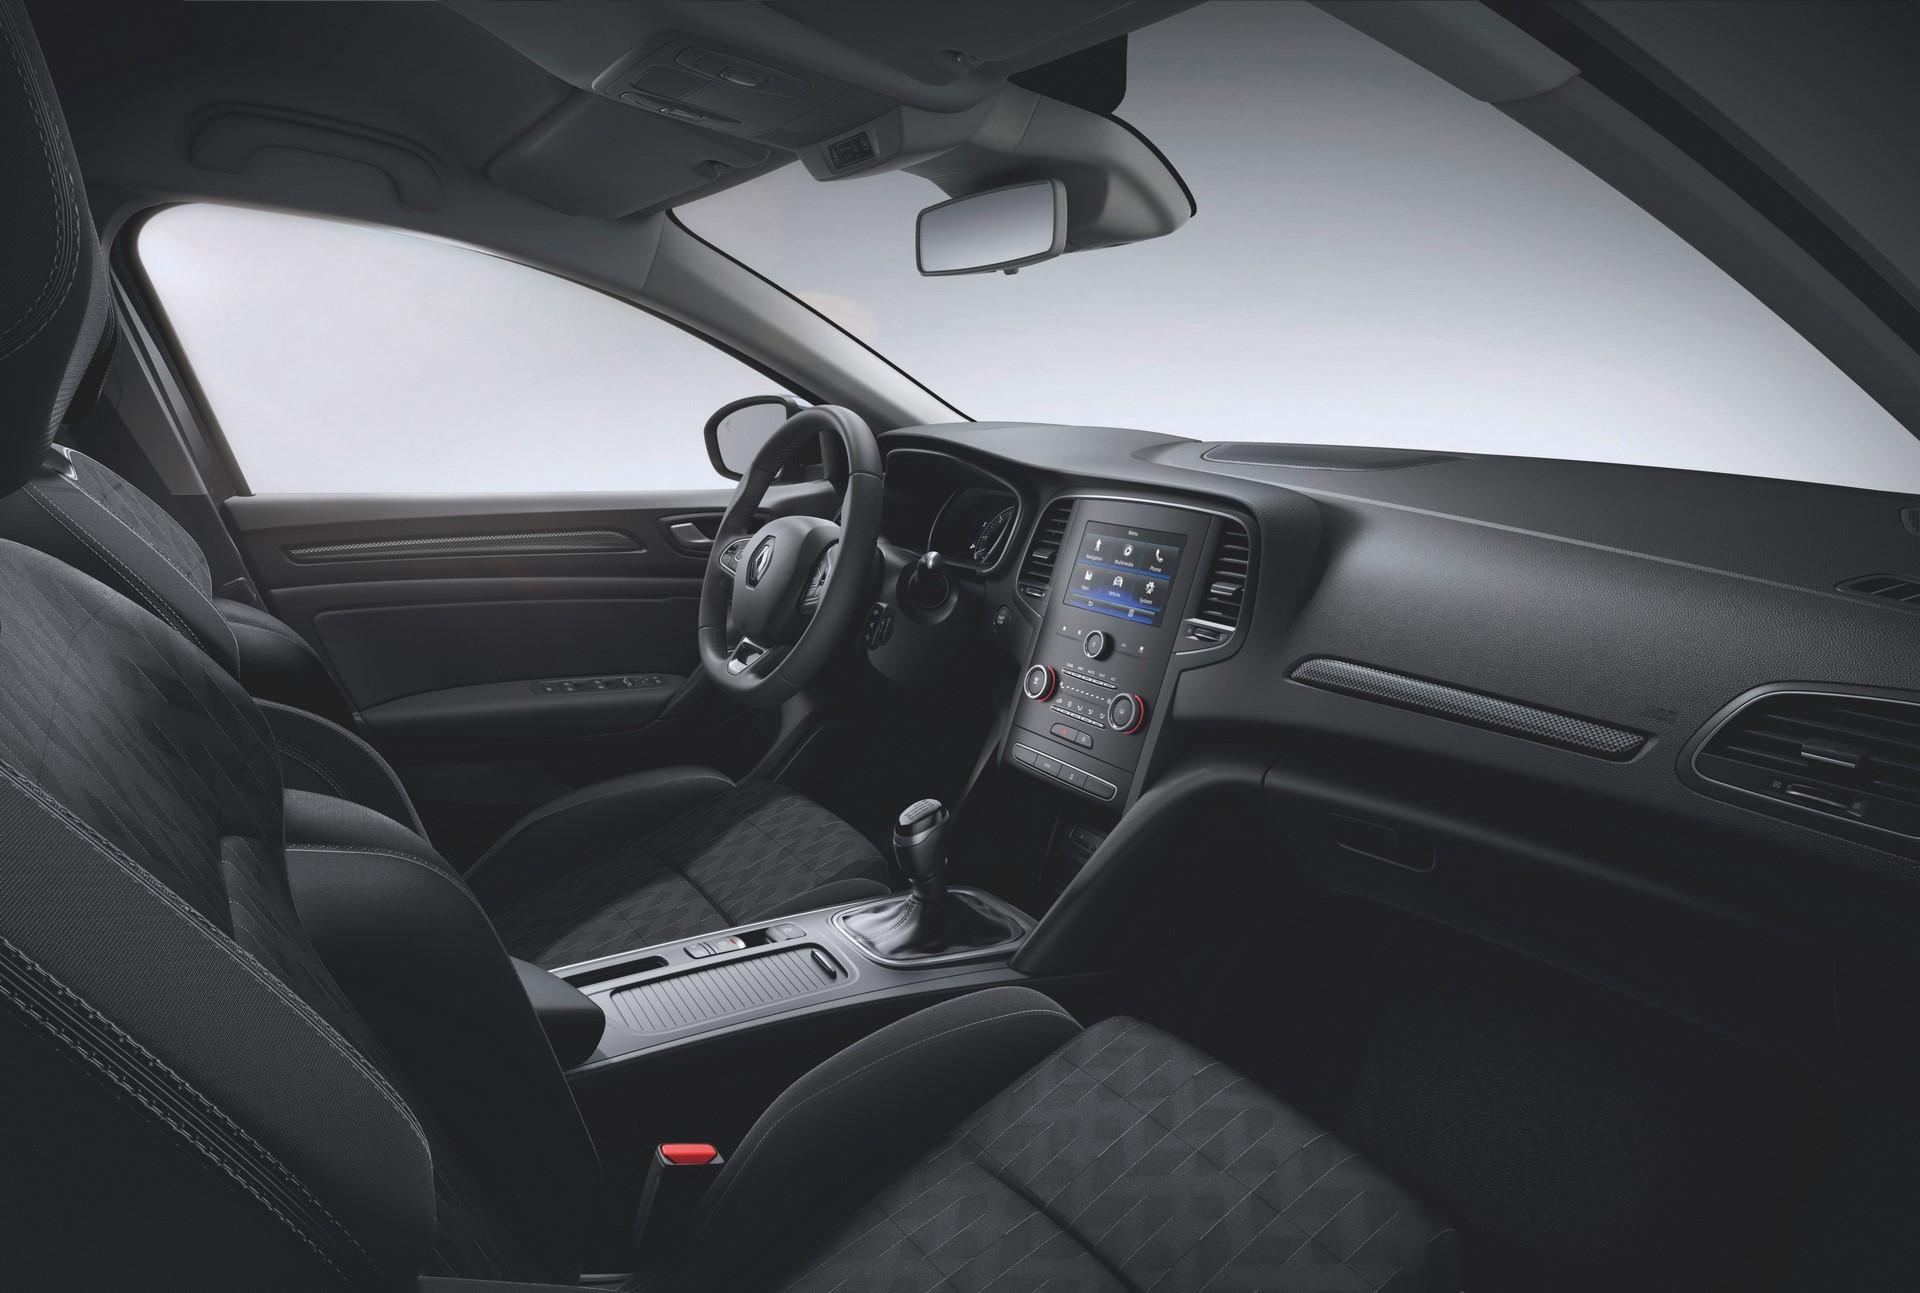 2019 - Renault MEGANE ESTATE Série Limitée Limited